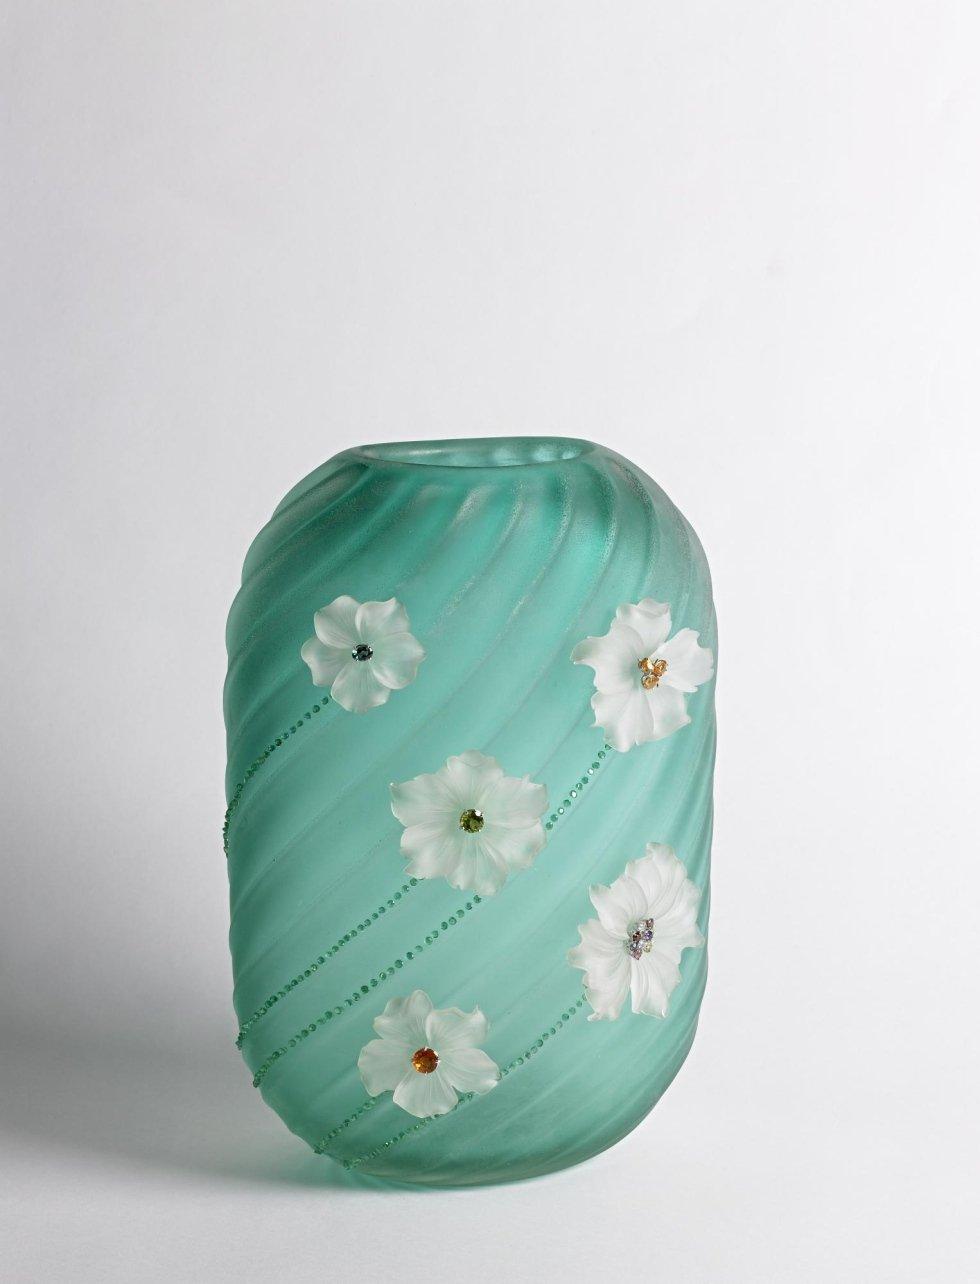 sale of Murano vases